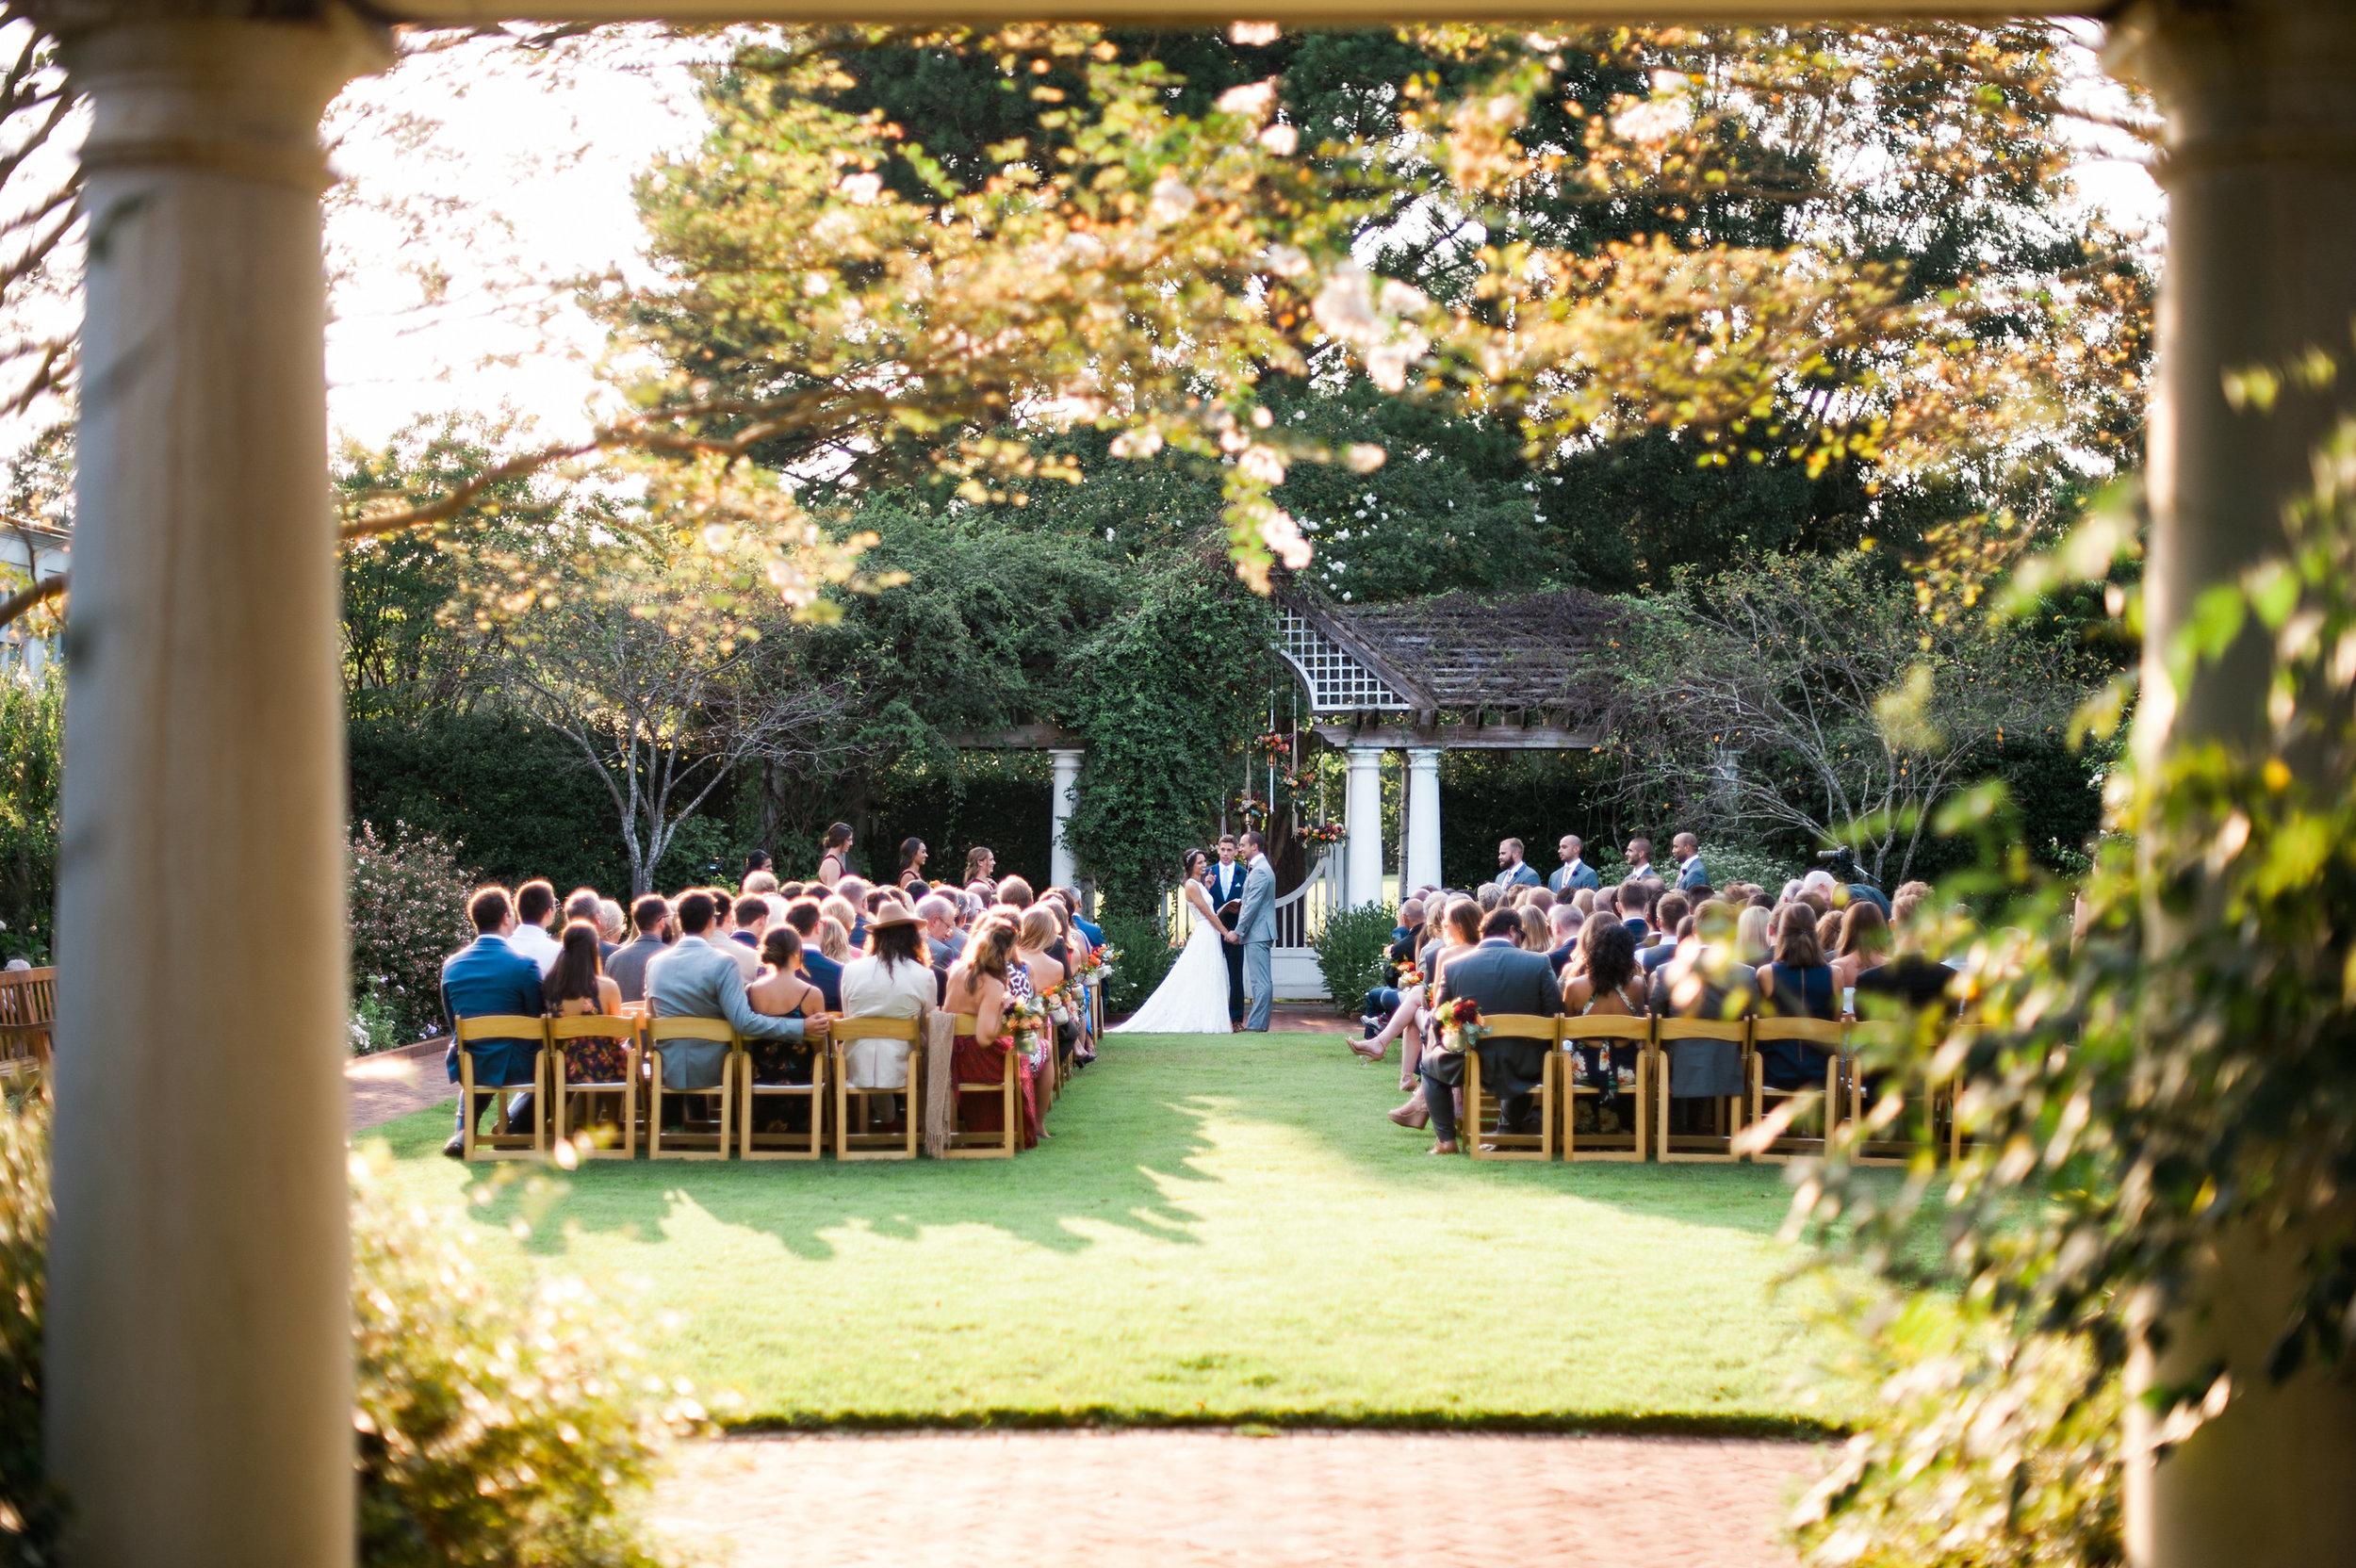 thomas-wedding-173-X5.jpg